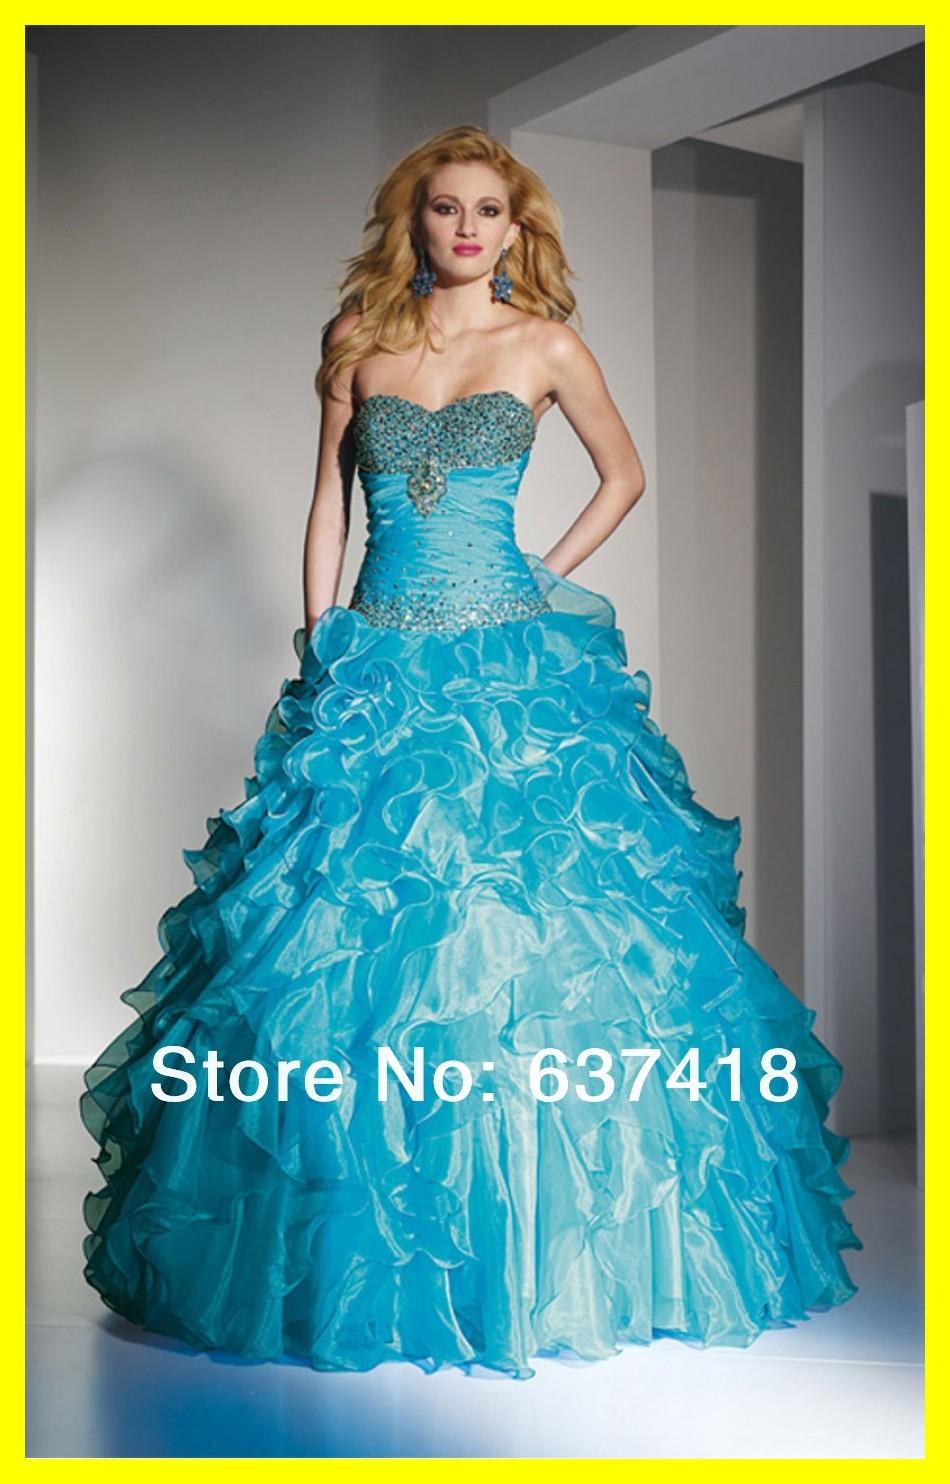 Fine Prom Dress Deb Gift - All Wedding Dresses - kreplicawatches.com